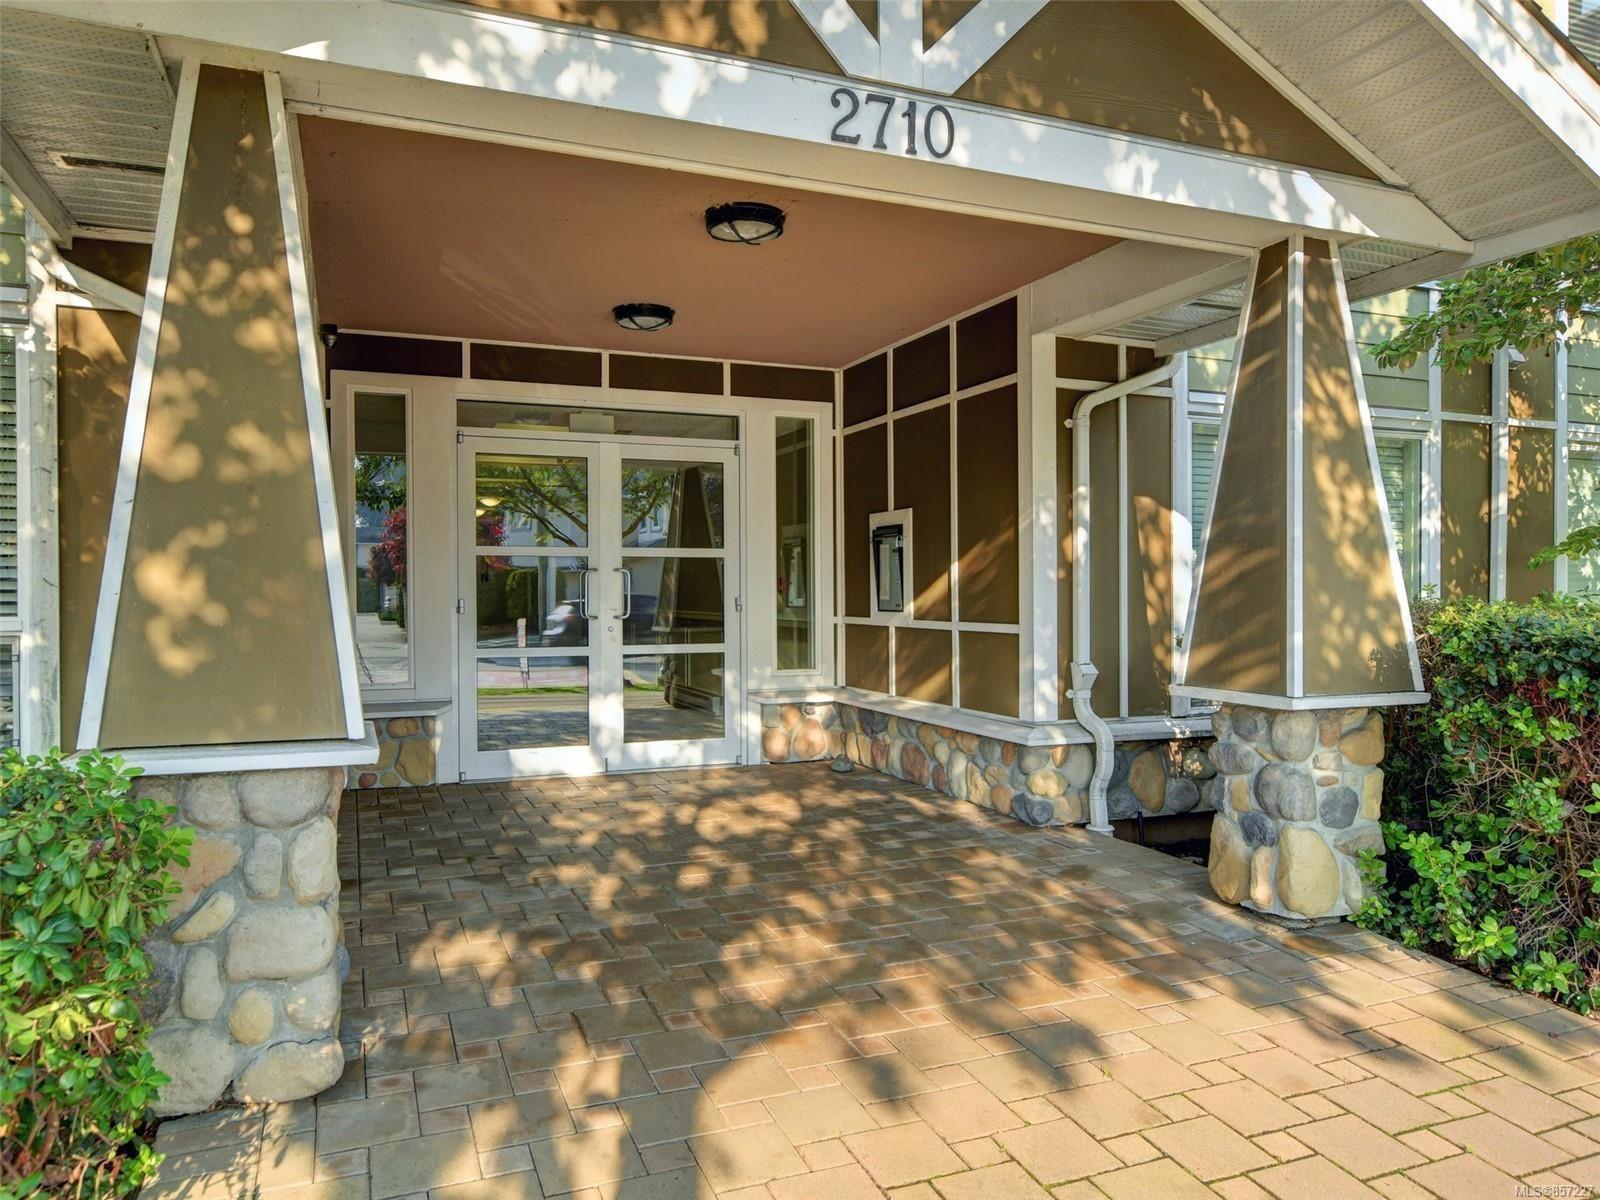 Main Photo: 202 2710 Jacklin Rd in : La Langford Proper Condo for sale (Langford)  : MLS®# 857227